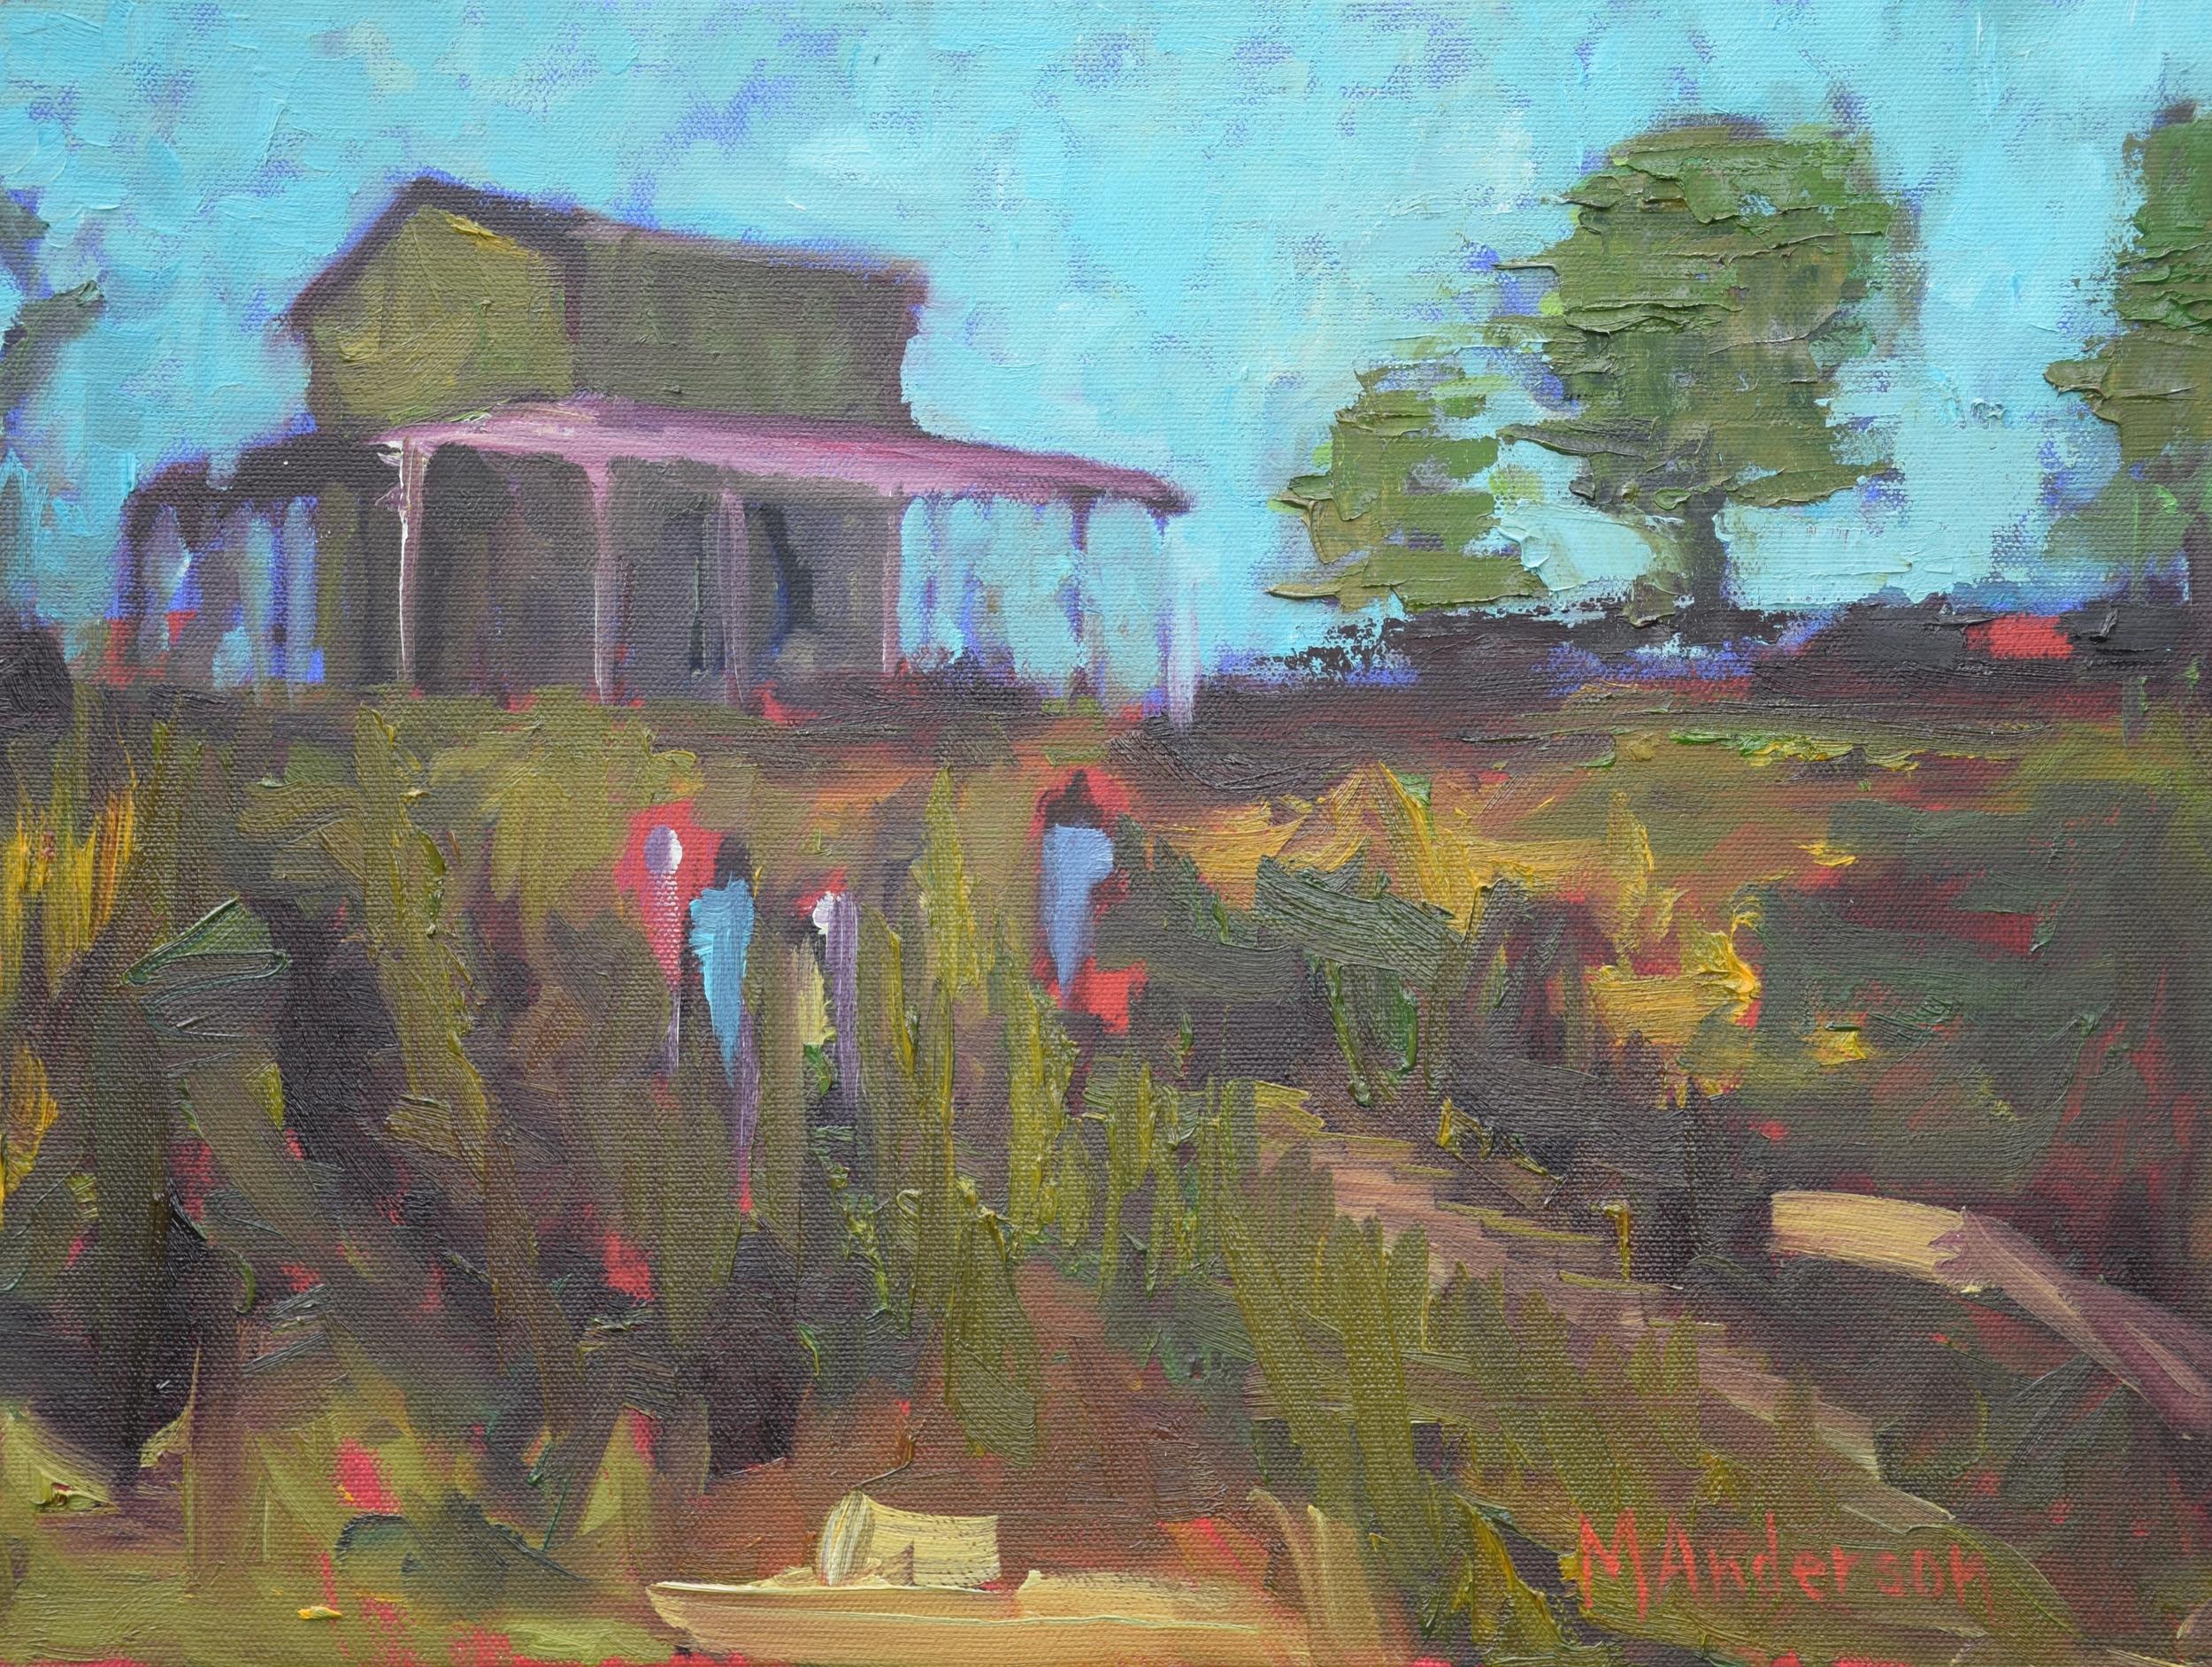 Pee Dee Barn (16x12 Canvas) - Sold